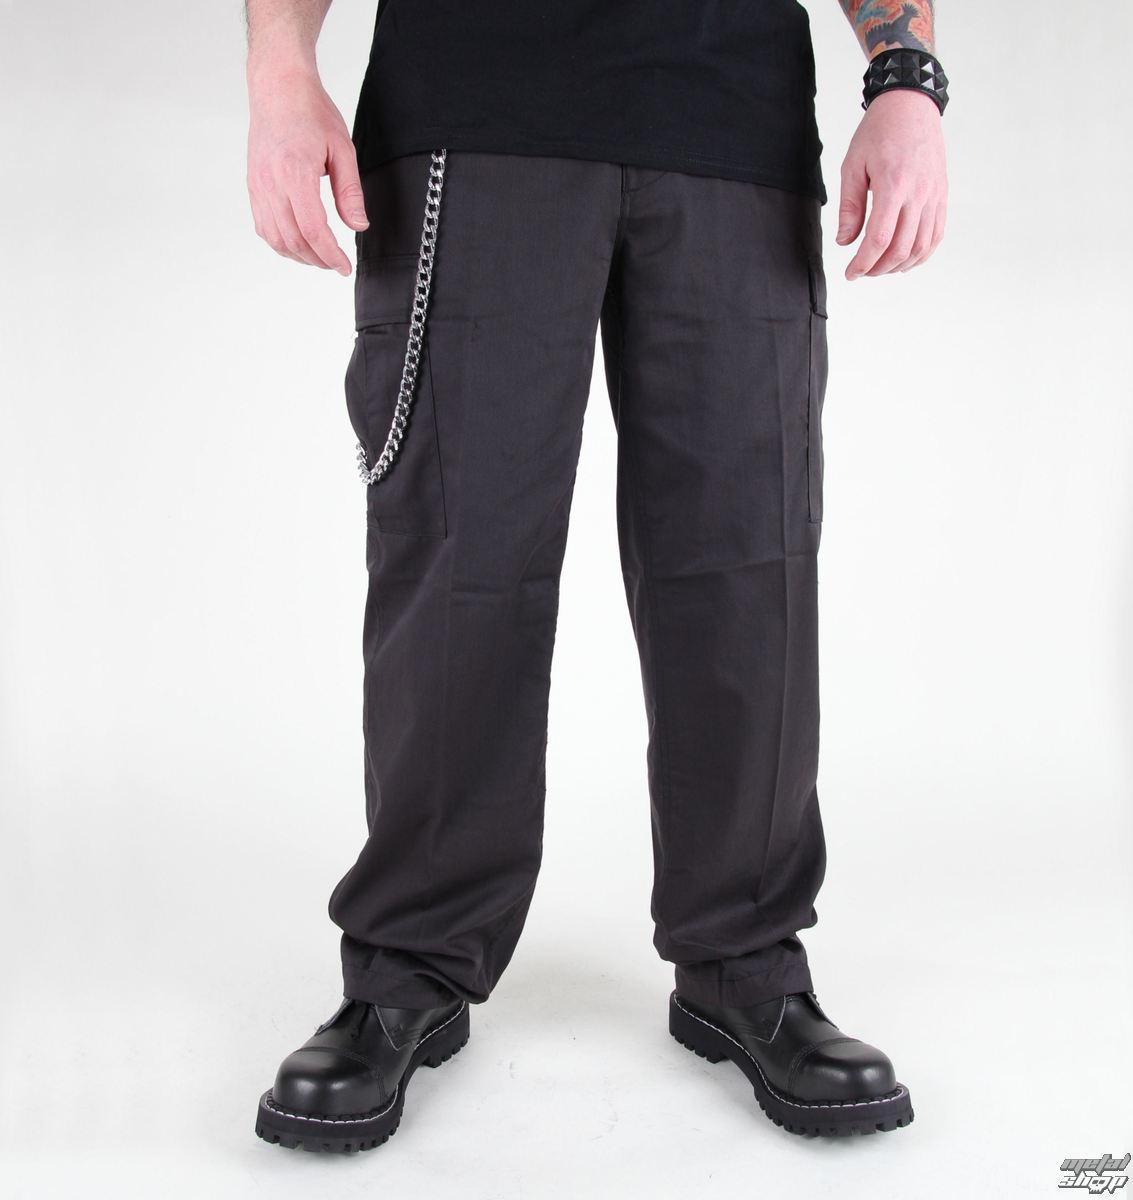 kalhoty pánské MIL-TEC - US Ranger Hose - BDU Black - 11810002